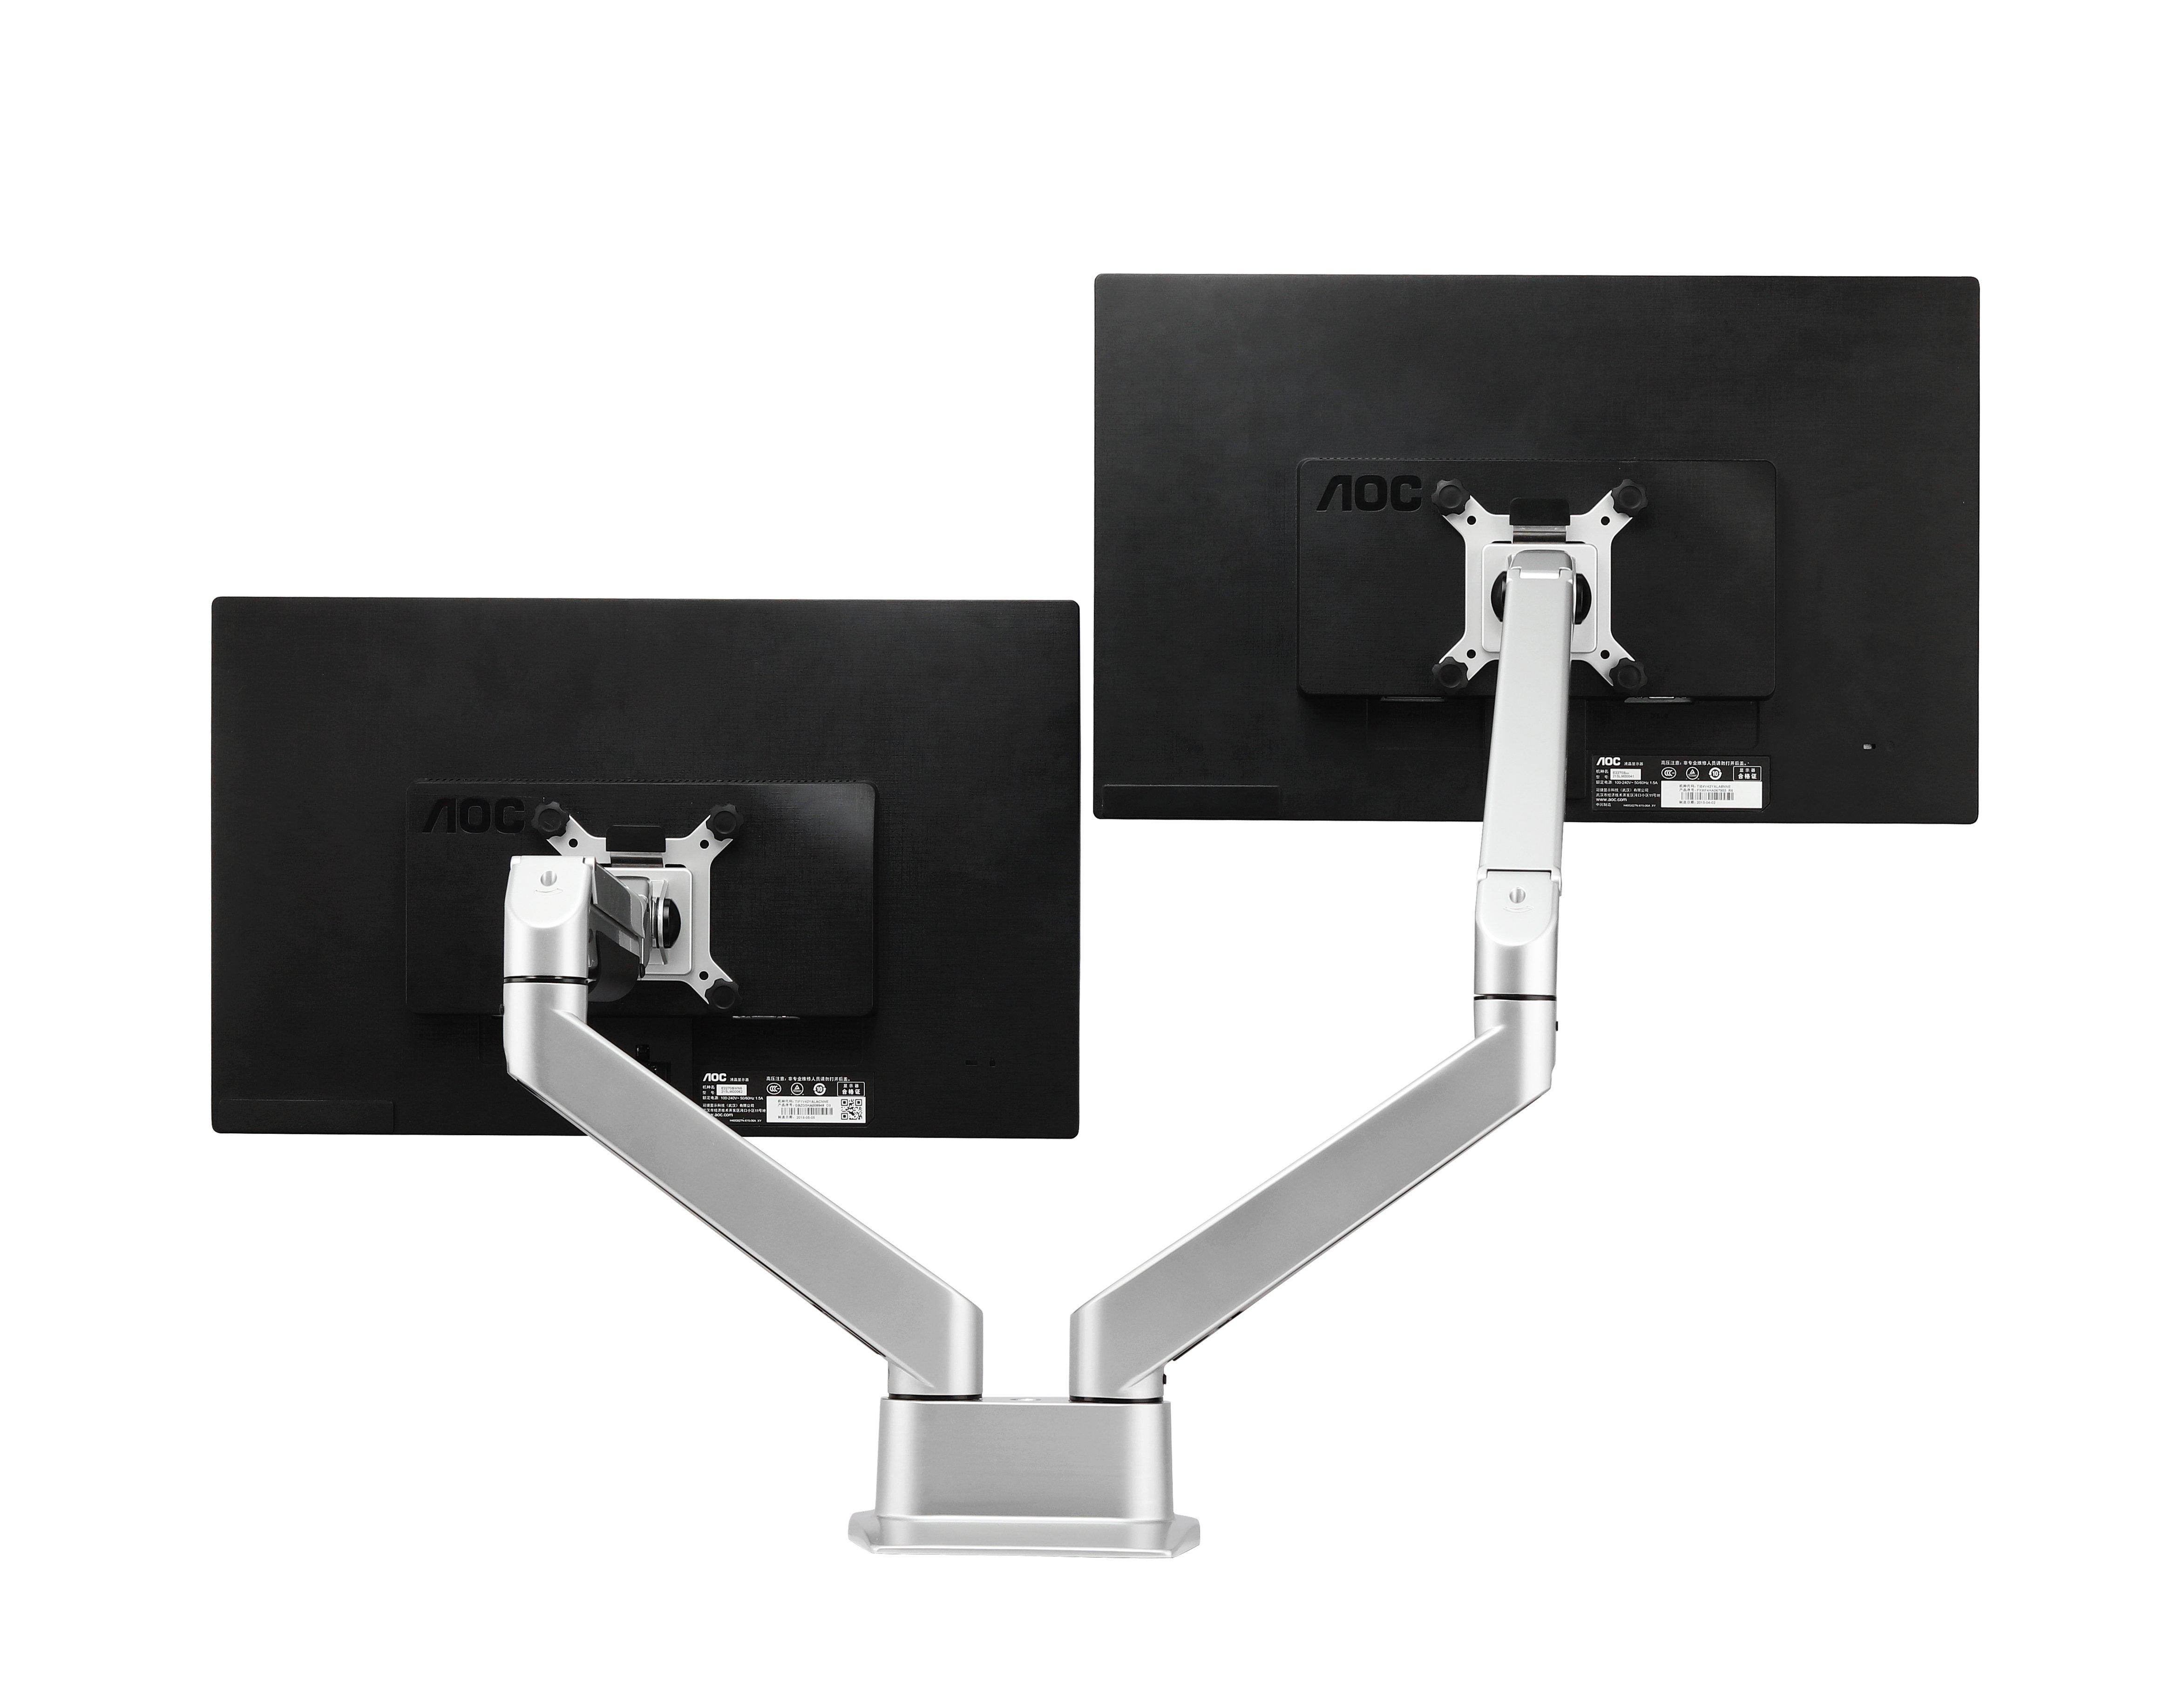 porta-monitor-gebesa